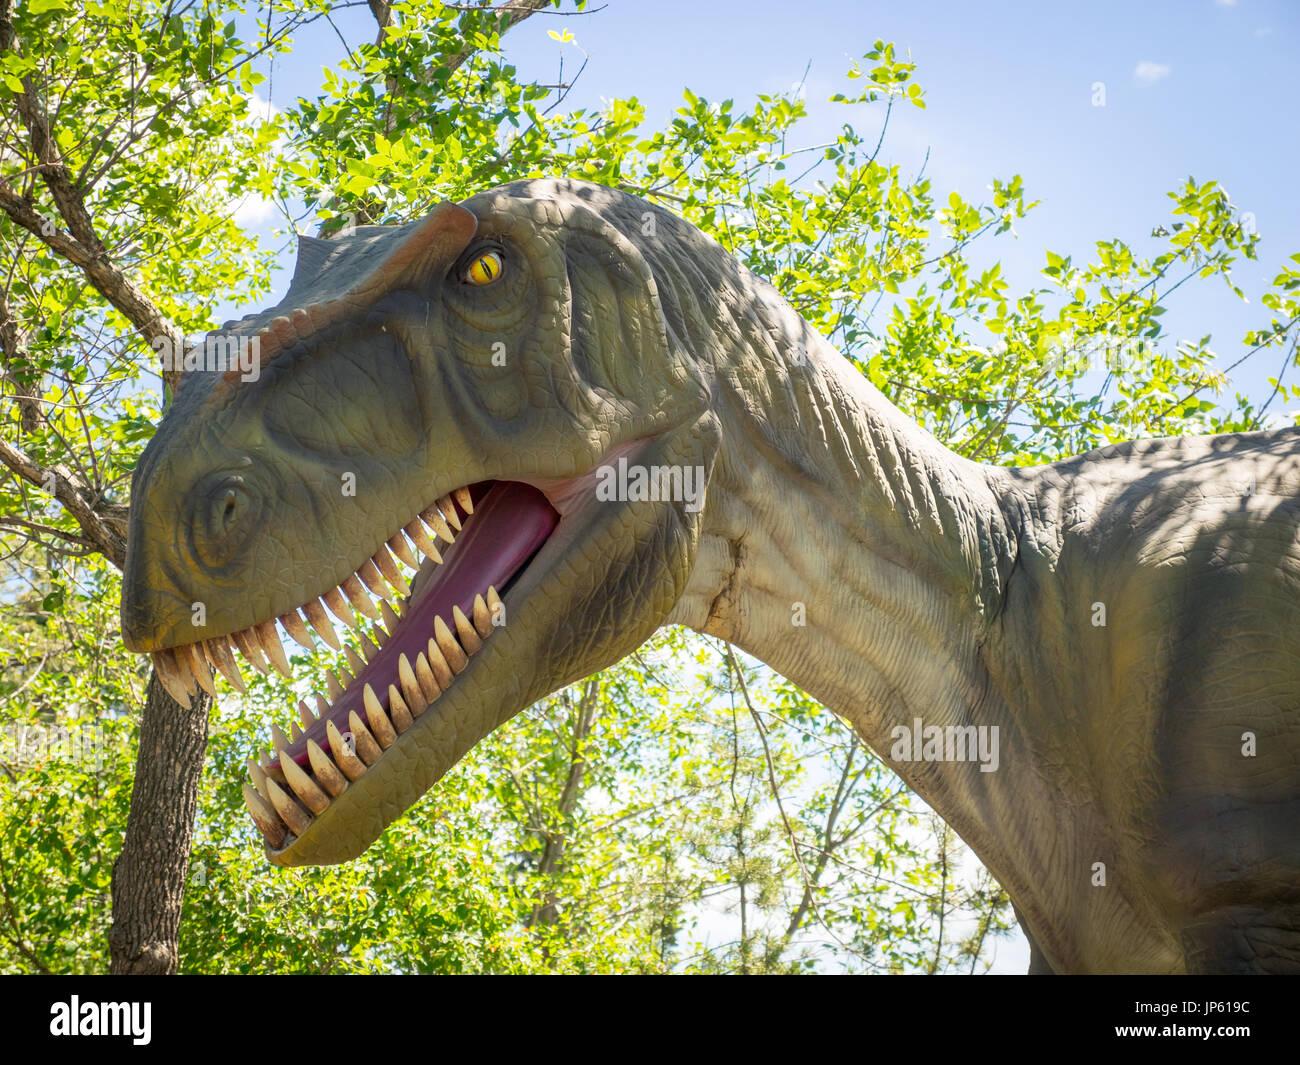 A life-sized model replica of a fearsome Tyrannosaurus rex at Prehistoric Park Calgary Zoo, Calgary, Alberta, Canada. - Stock Image